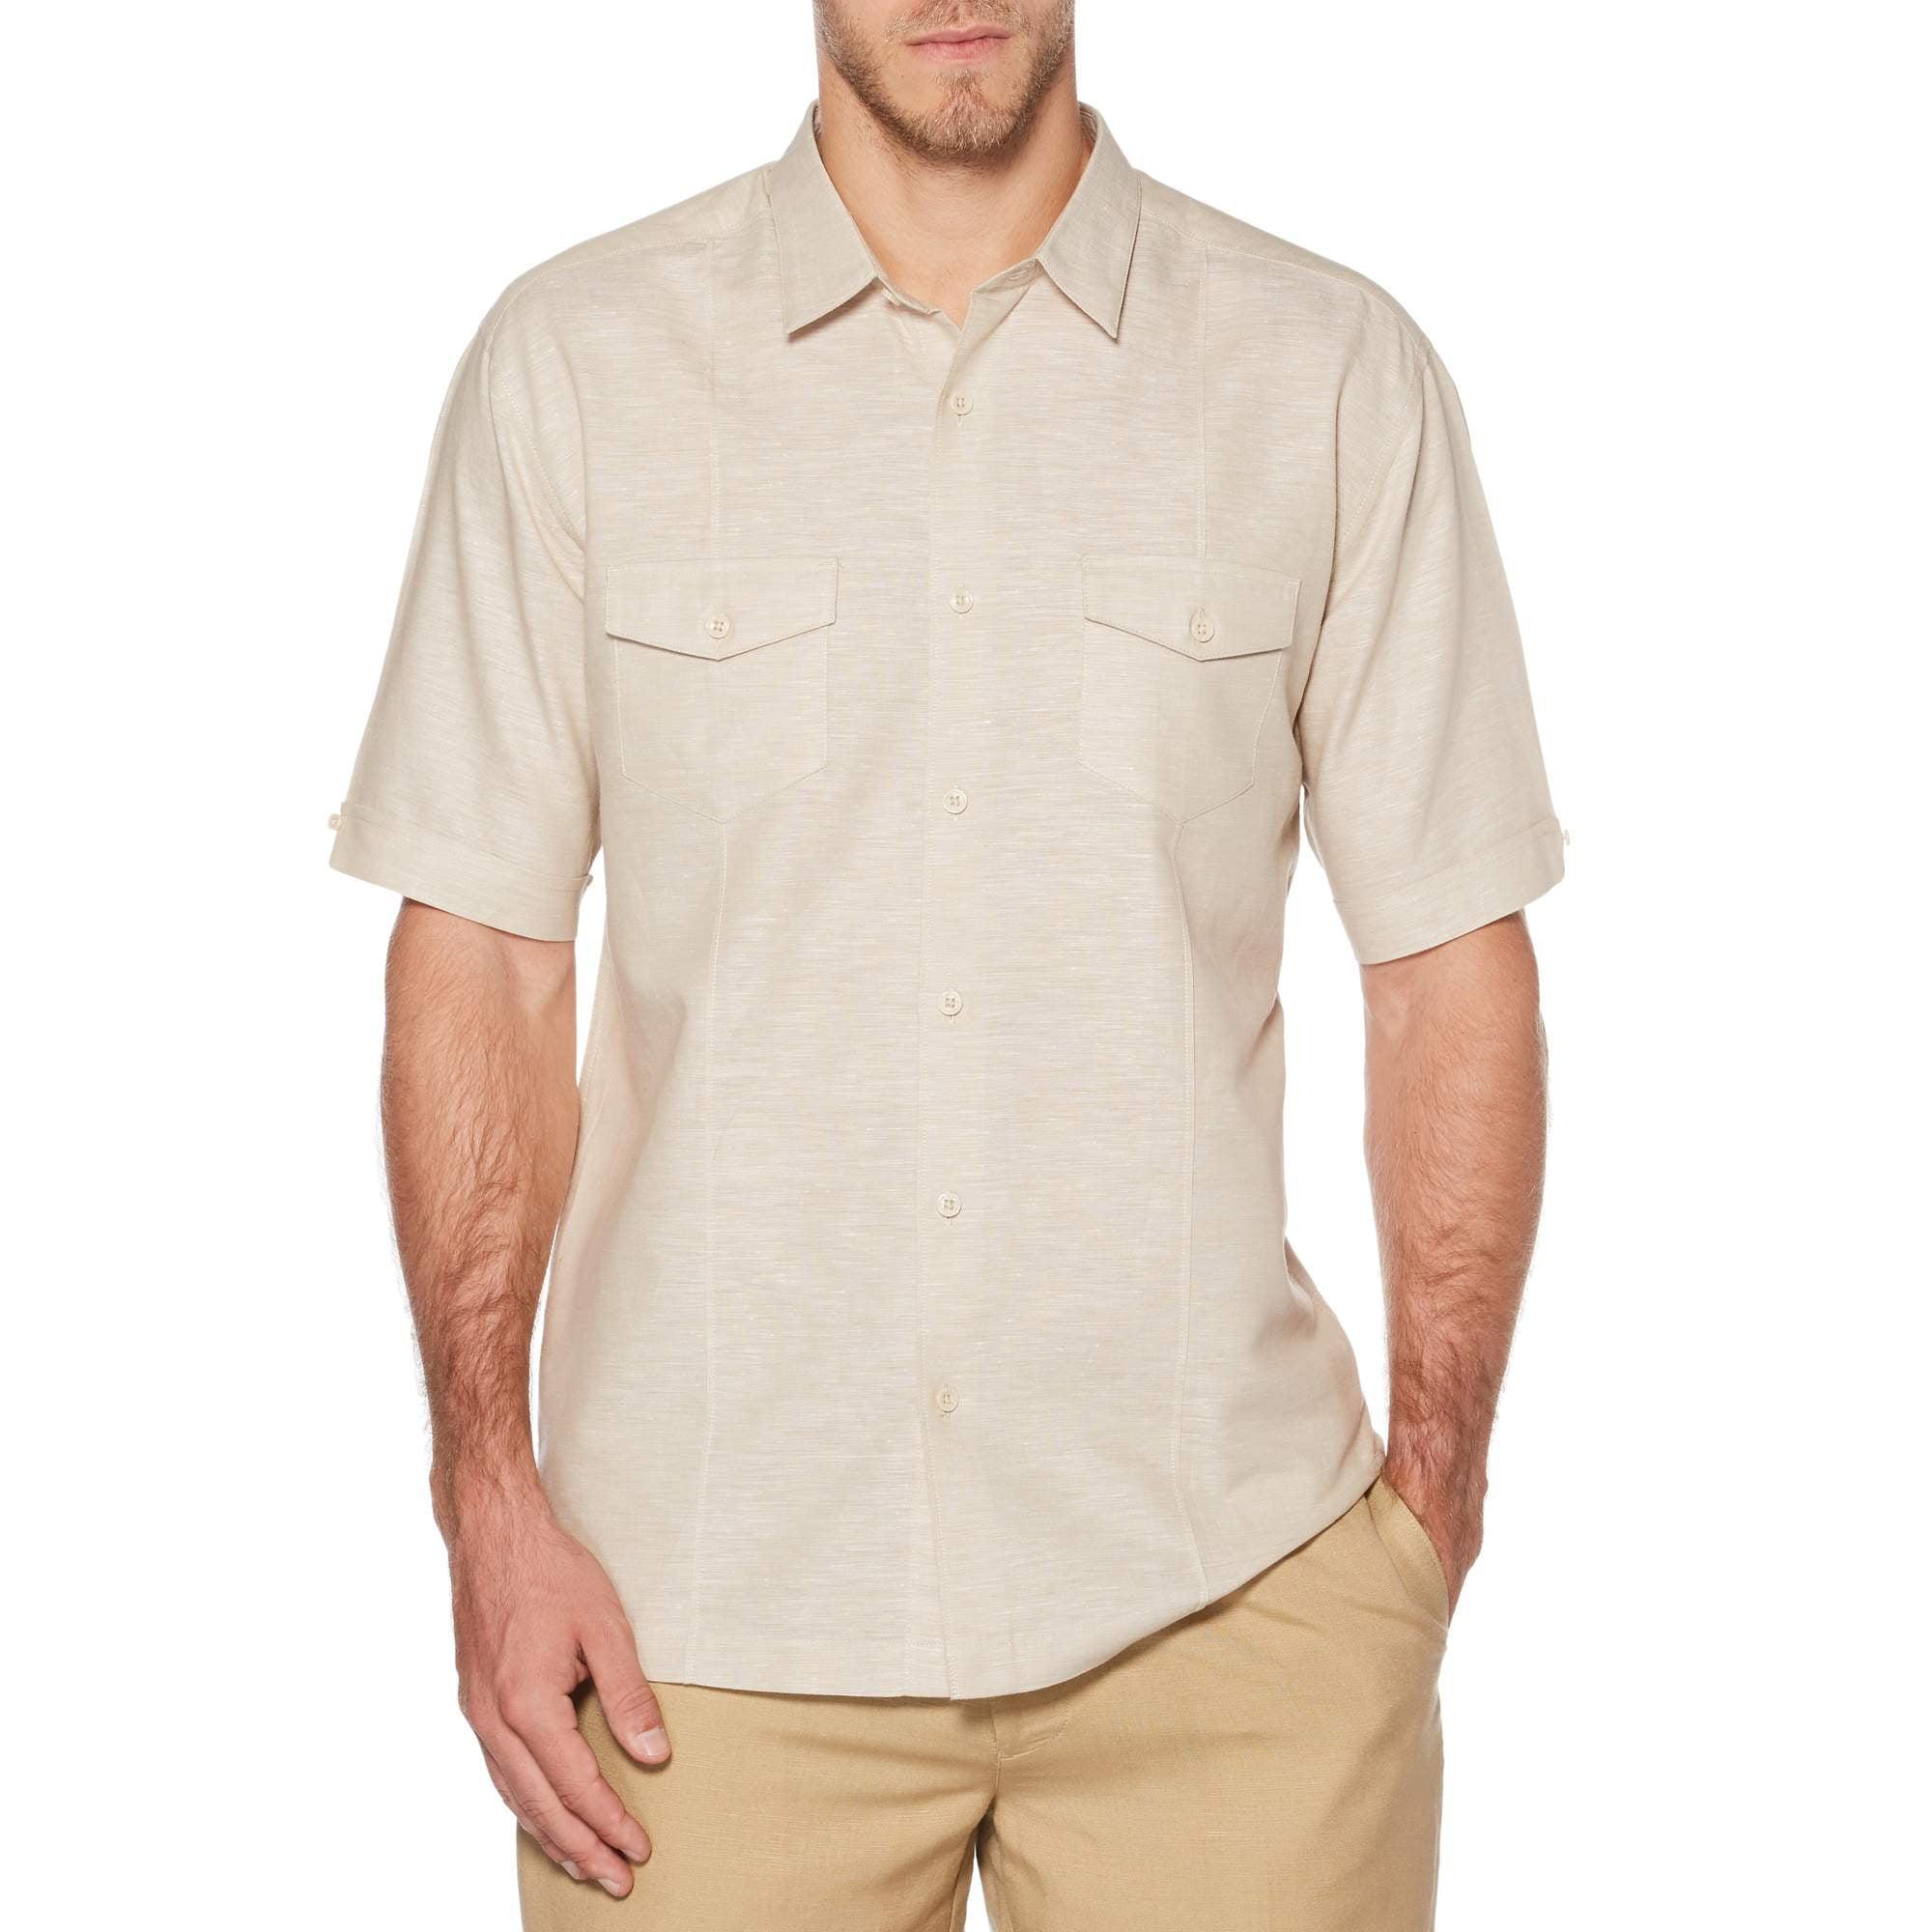 Big Men's Short Sleeve Linen Cotton Single Tuck Woven Shirt with Upper Pockets